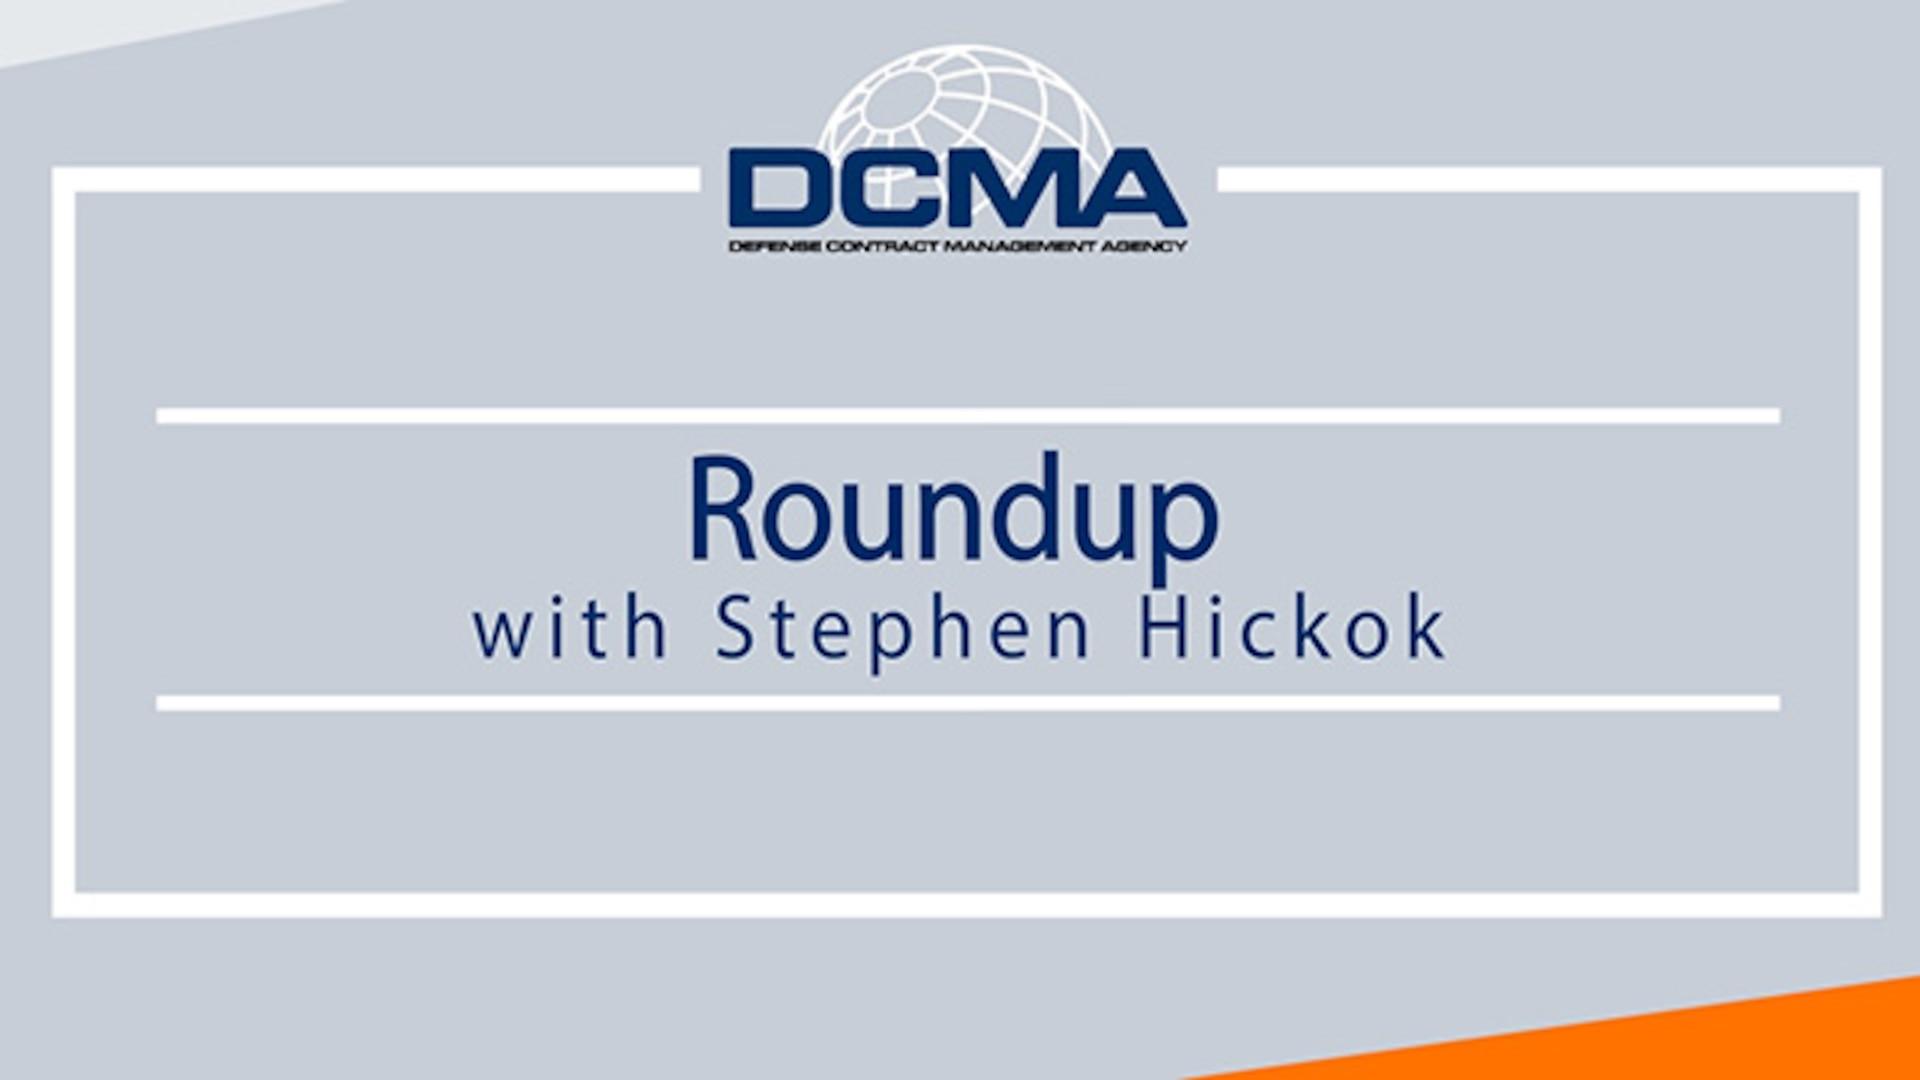 January DCMA Roundup